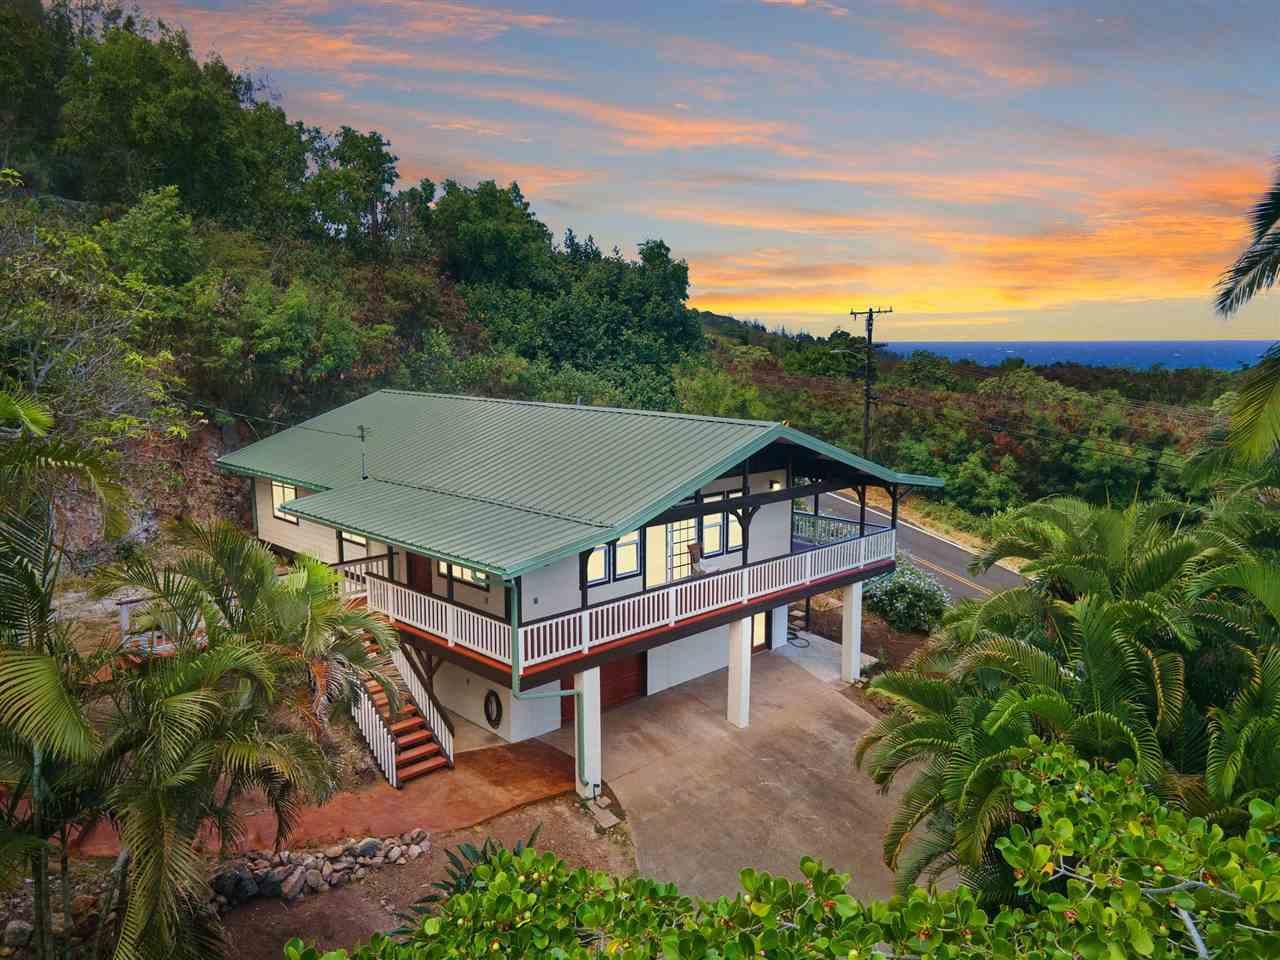 $1,395,000 - 3Br/2Ba -  for Sale in Wailuku